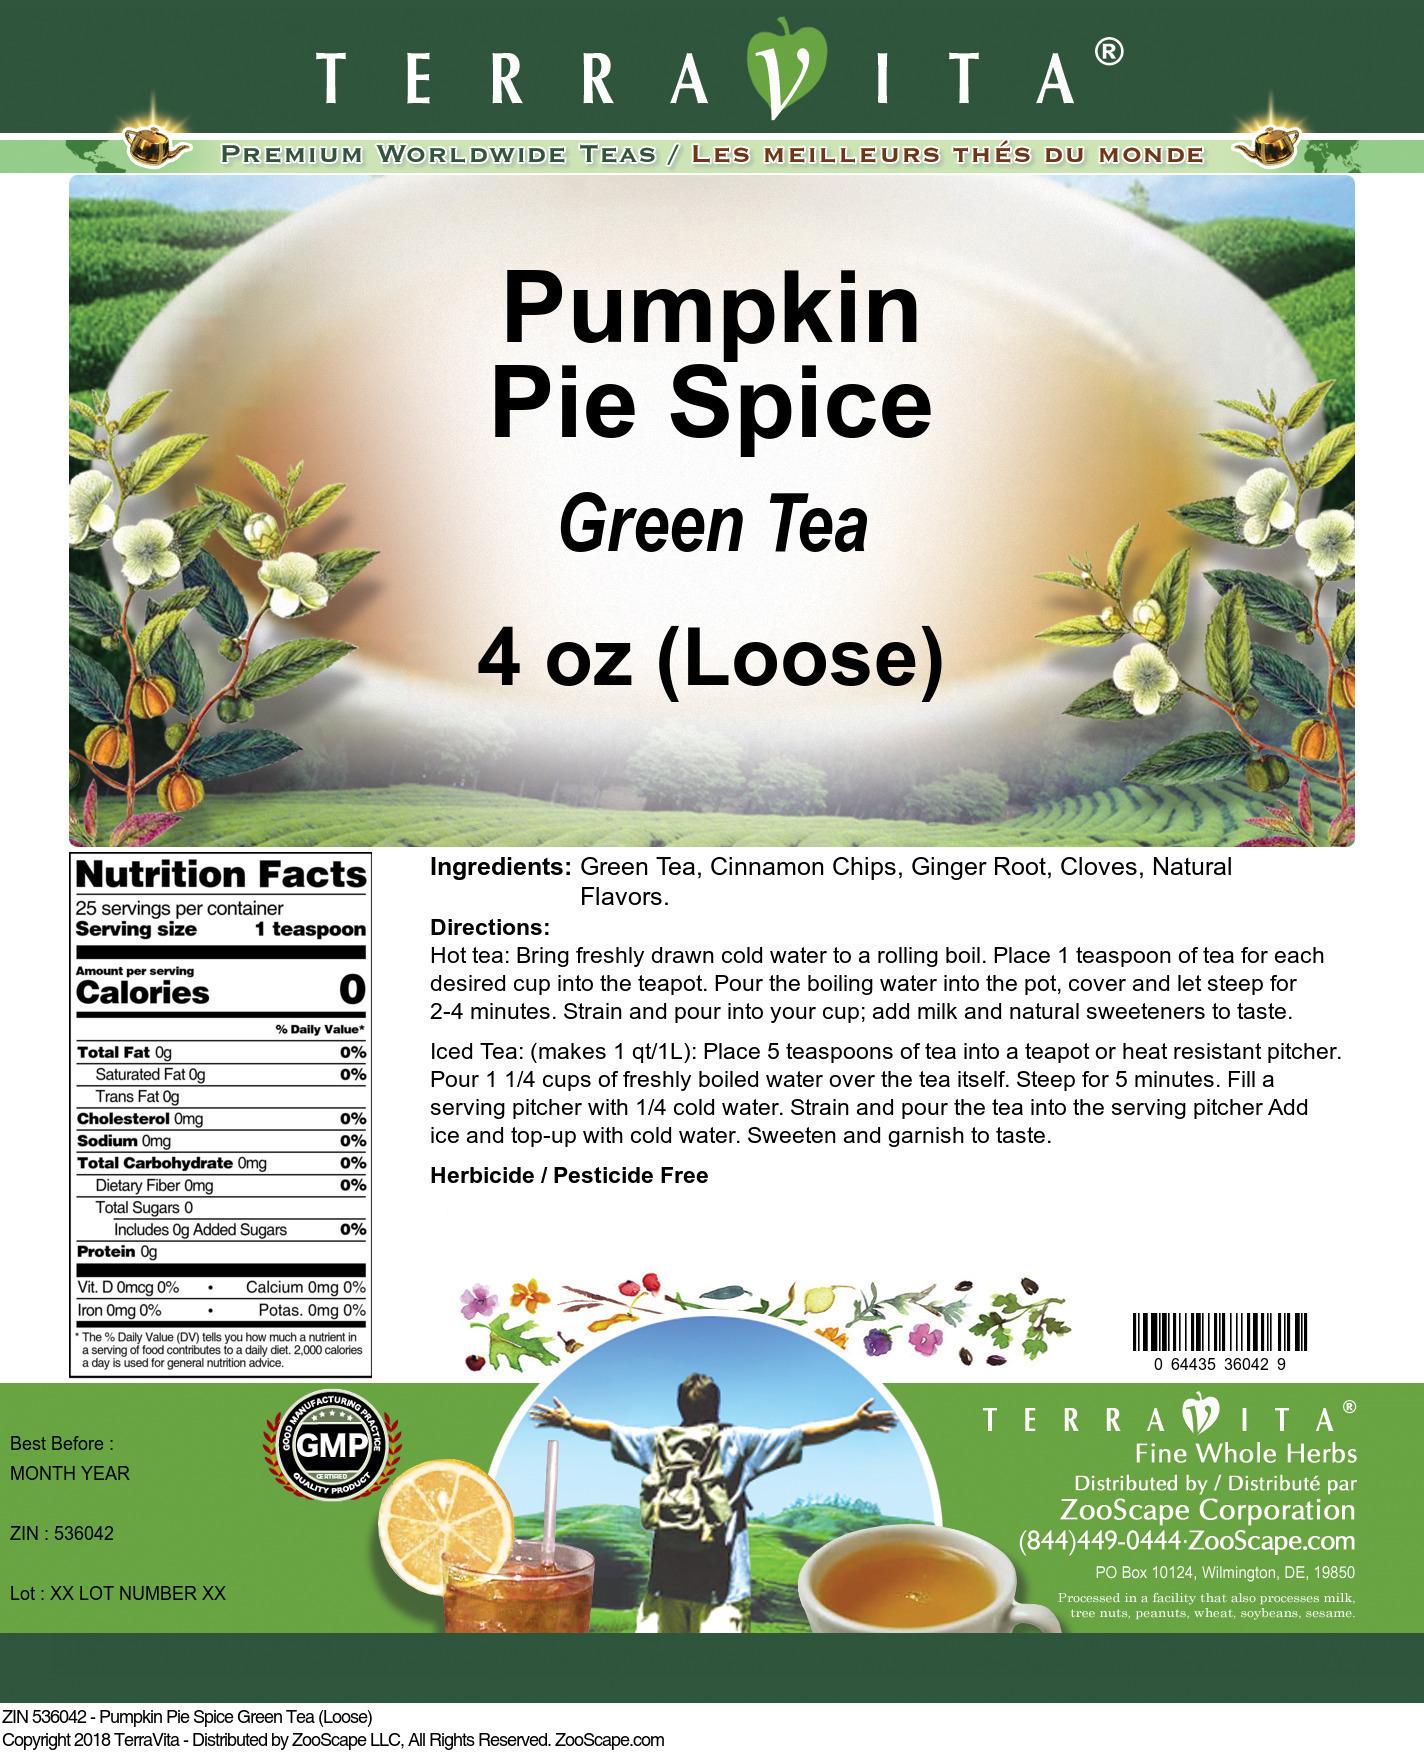 Pumpkin Pie Spice Green Tea